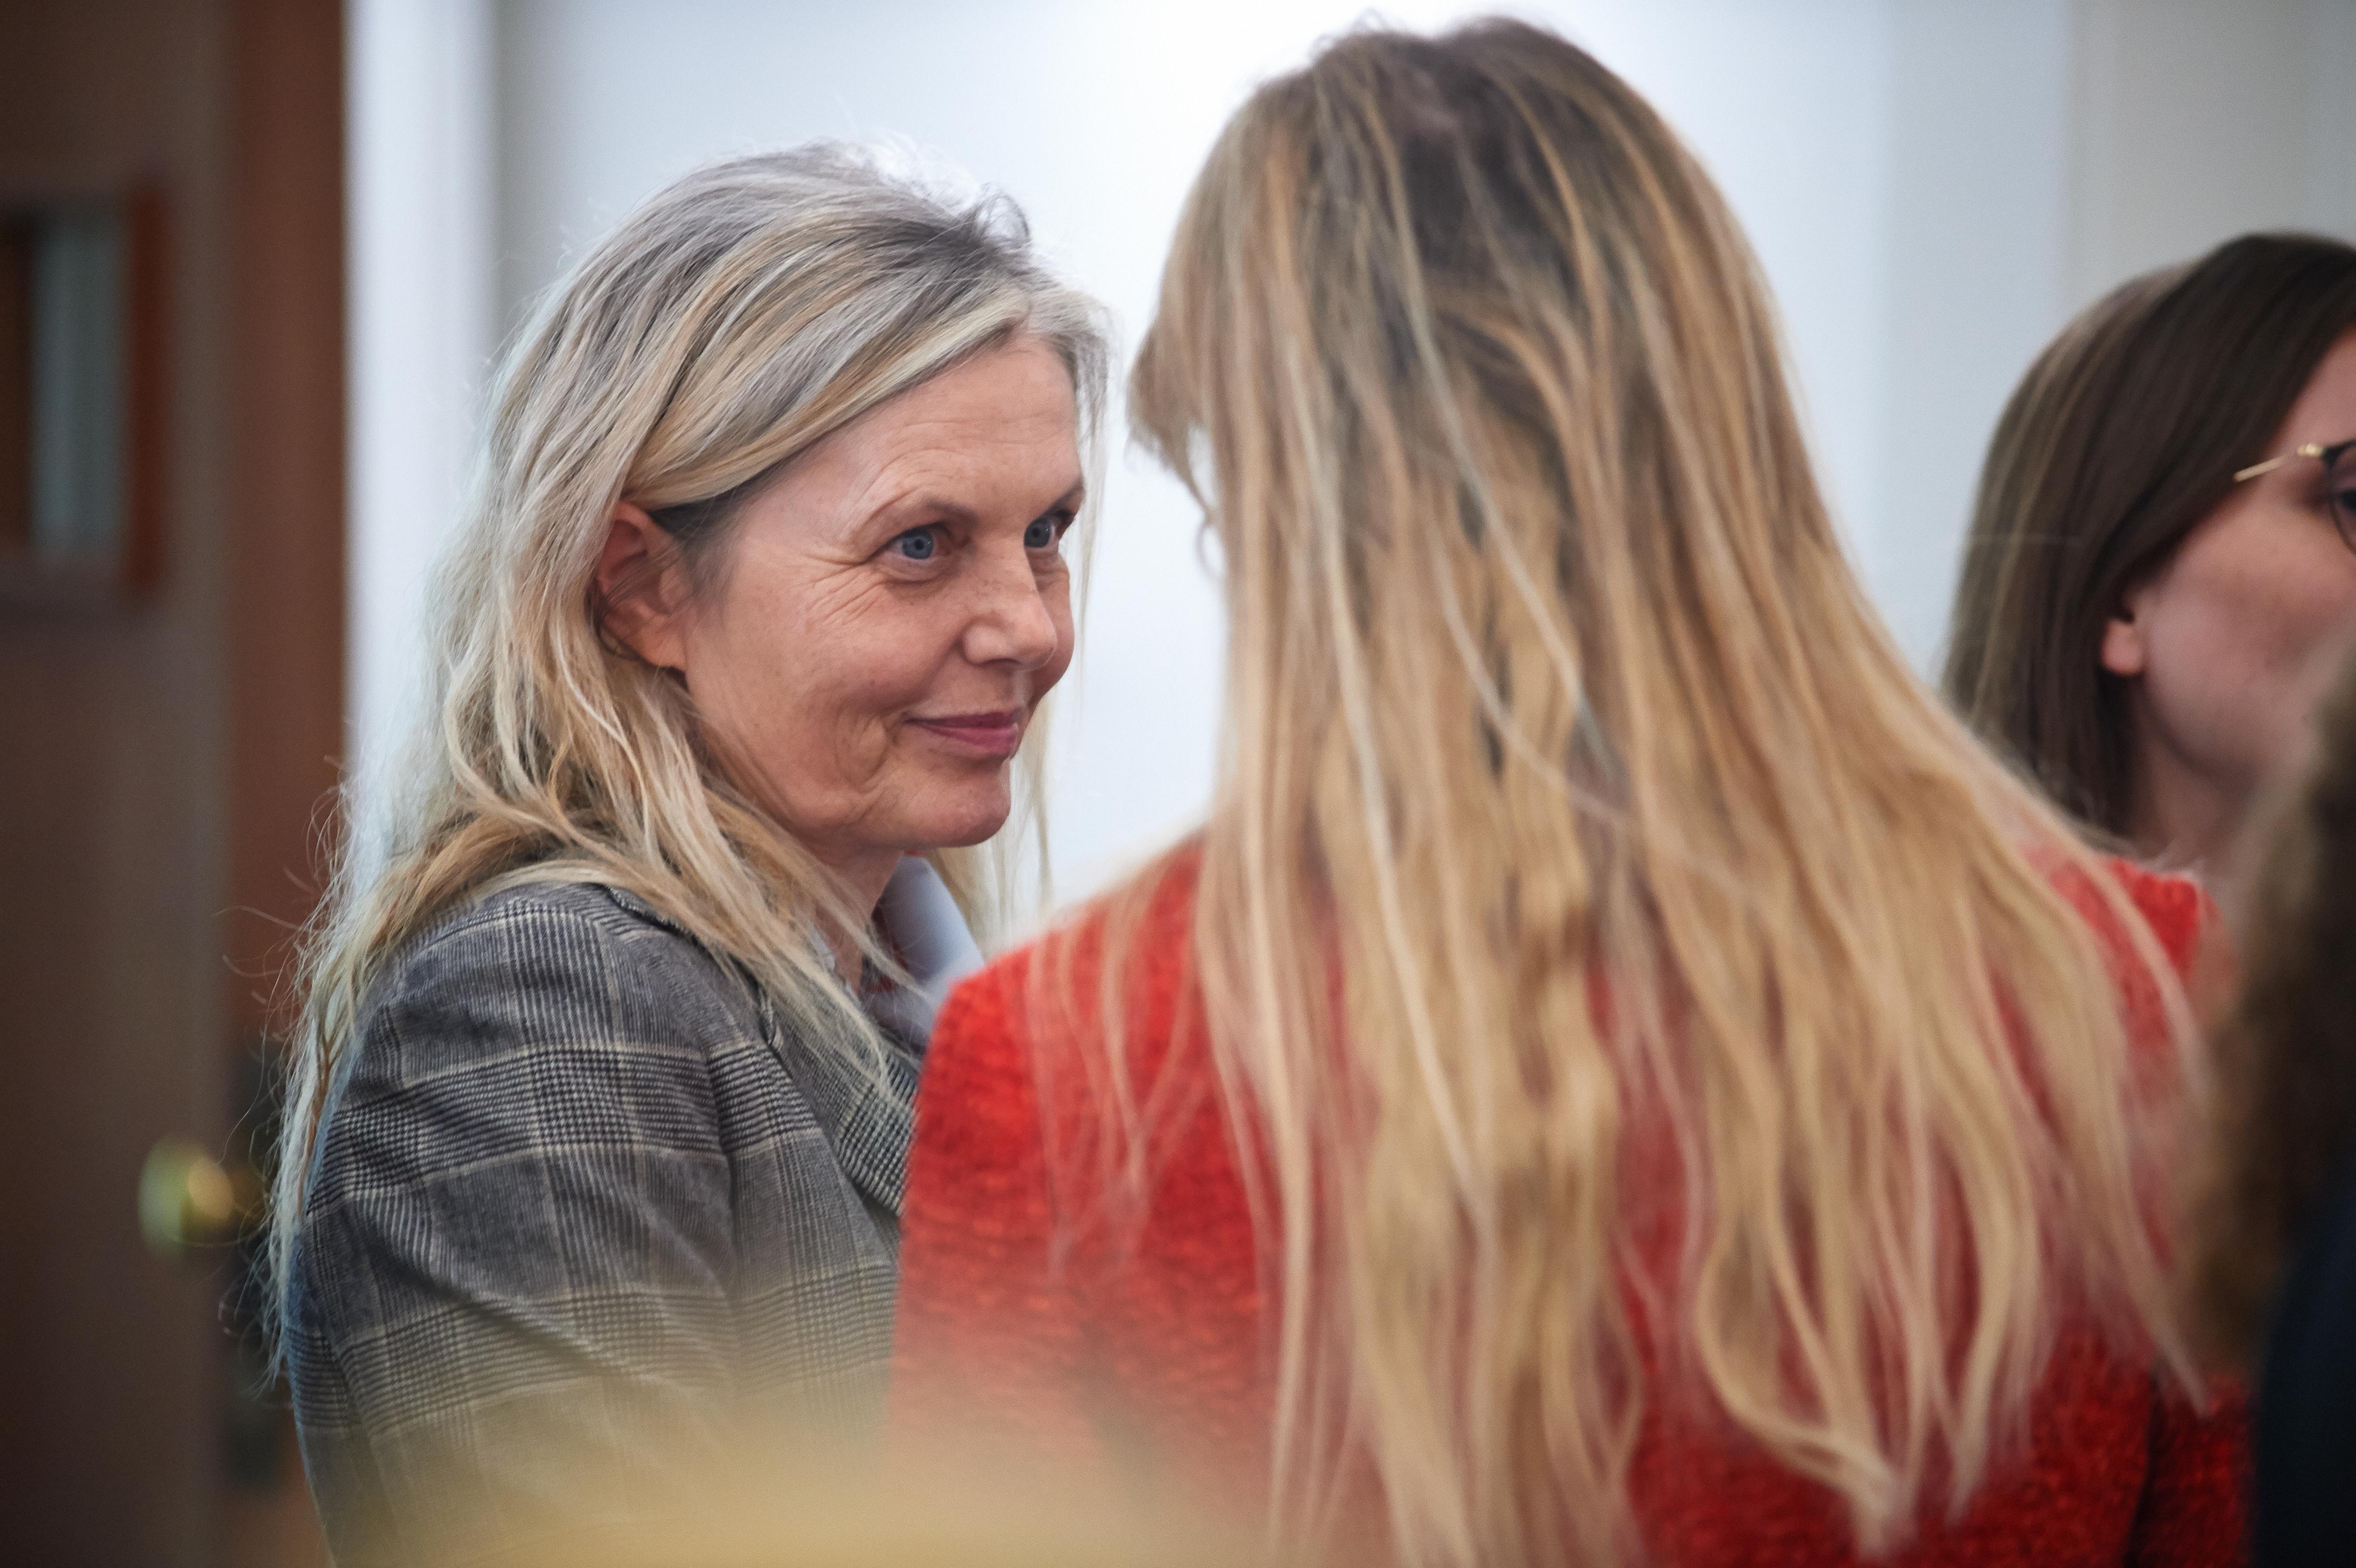 susanne heller 5 - Ilse Aigner zu Gast bei heller & partner